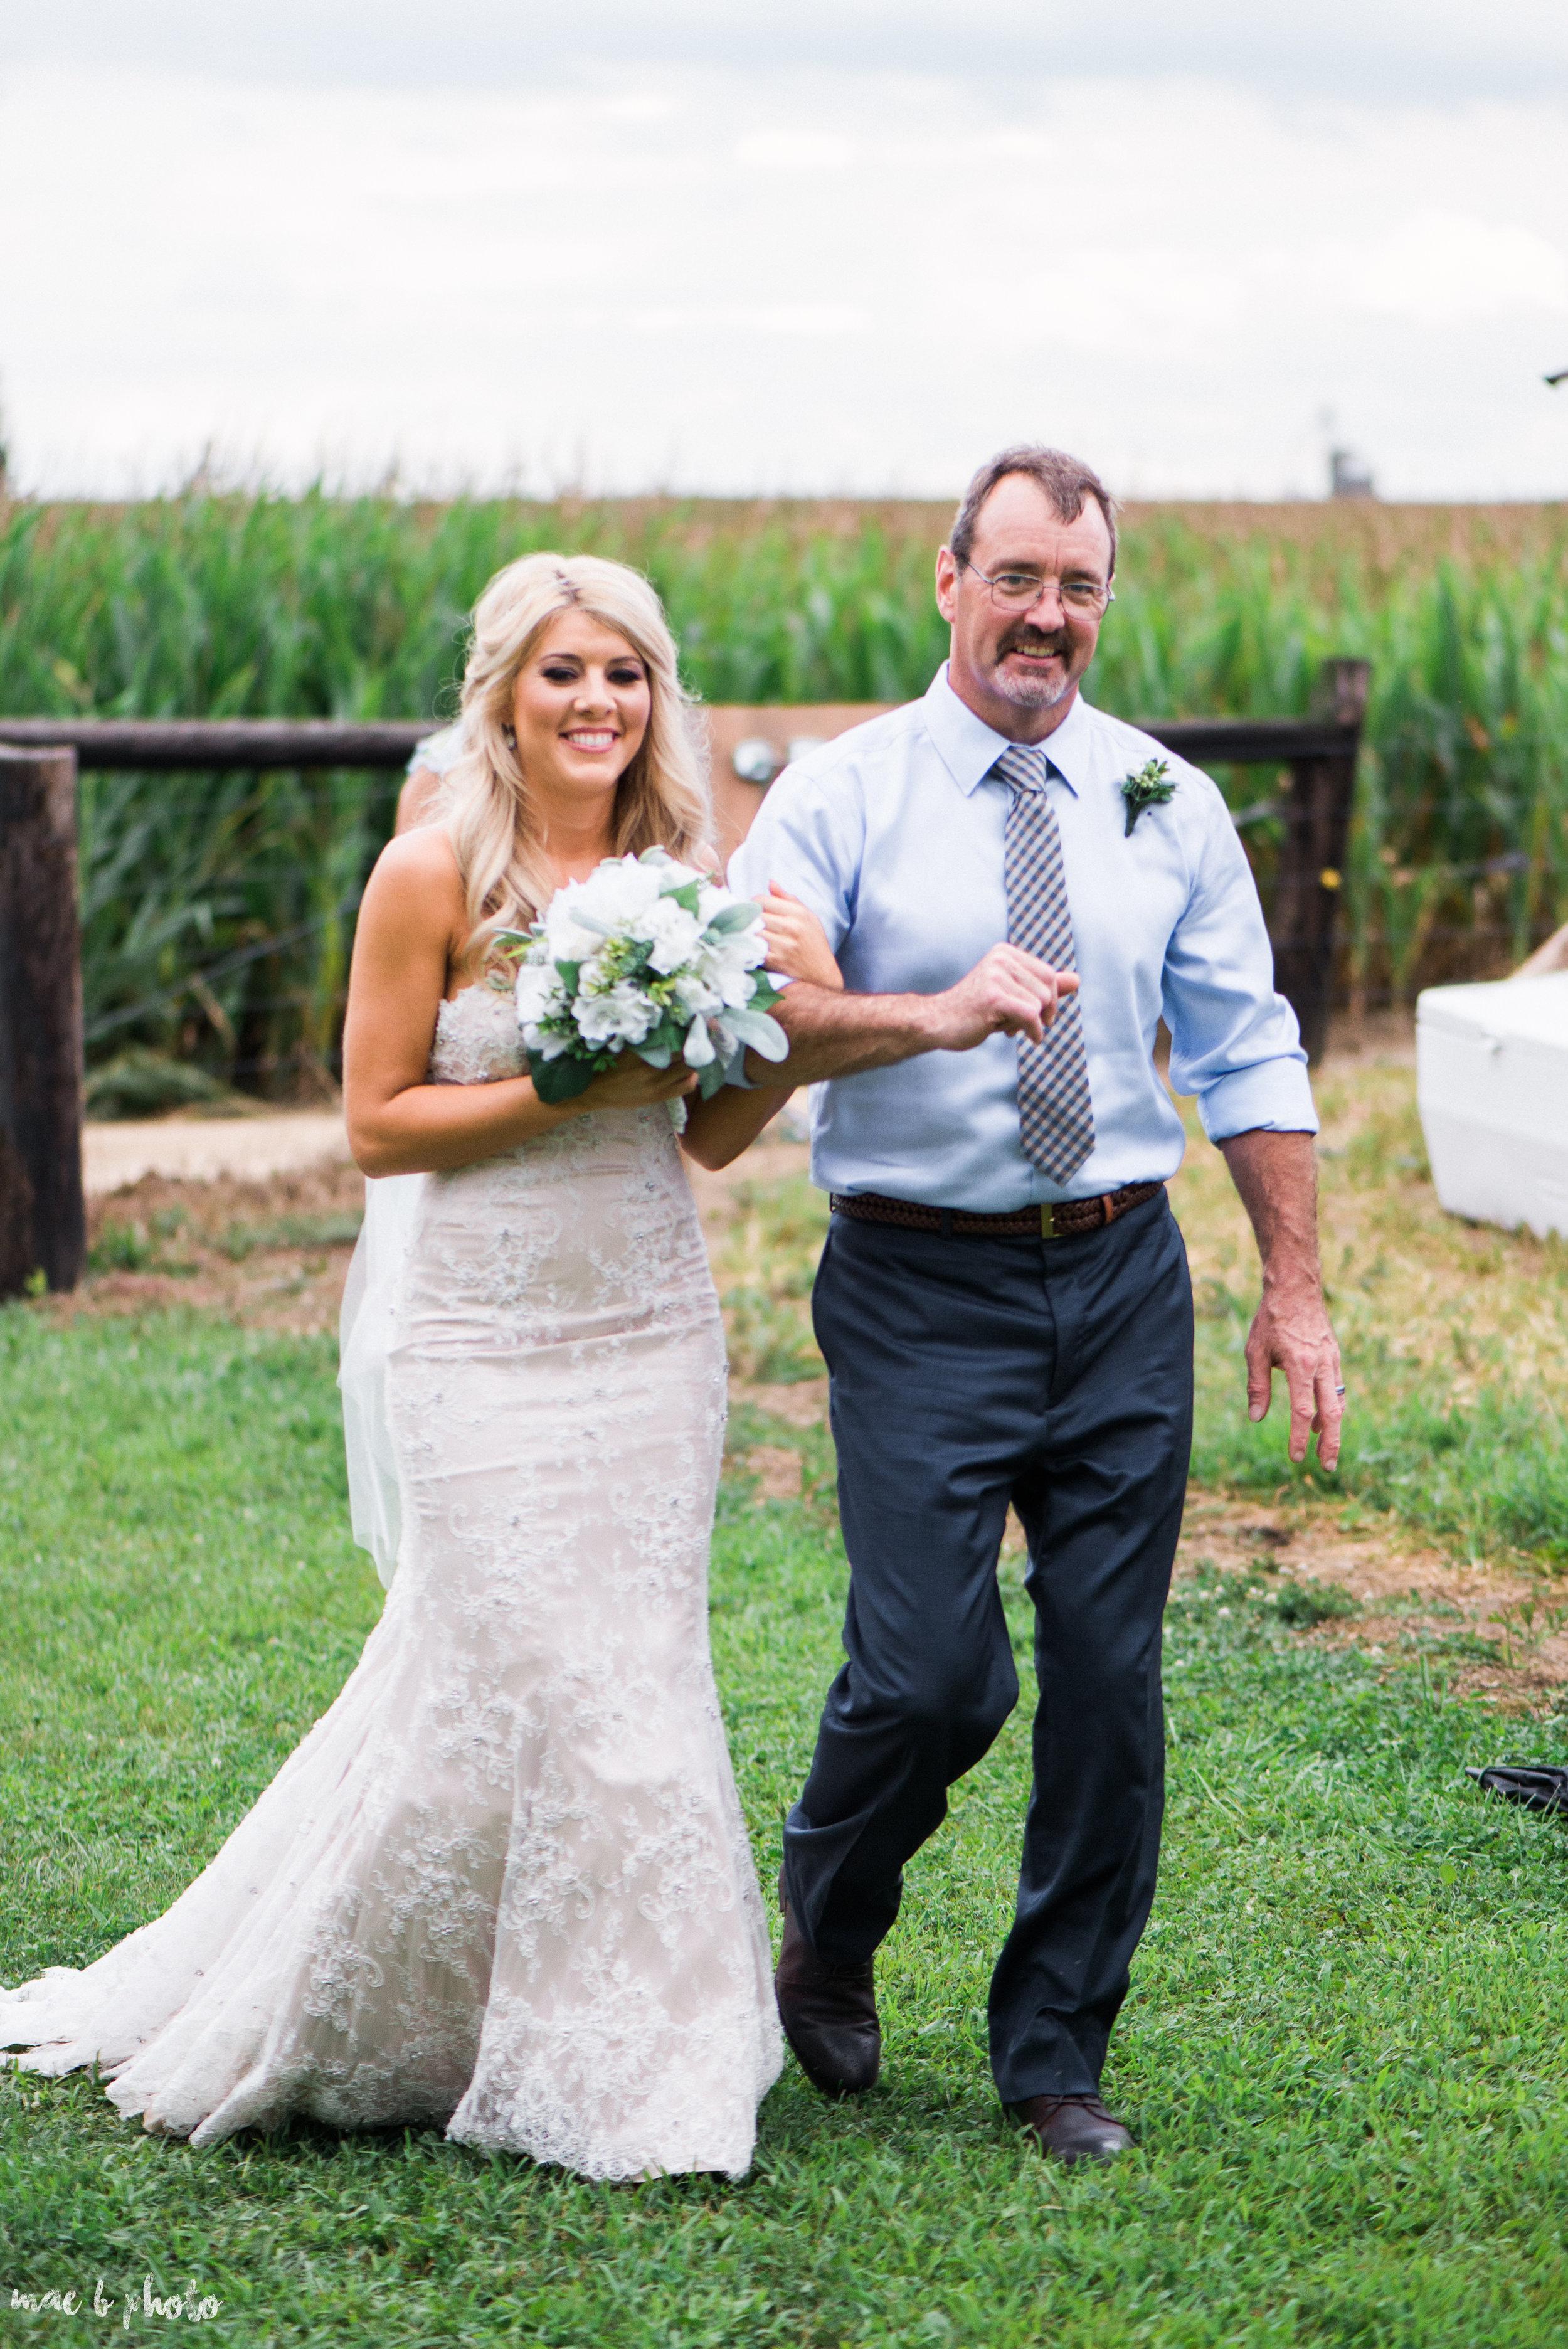 Tara & Matt's Elegant Backyard Summer Wedding in Kinsman, Ohio-41.jpg